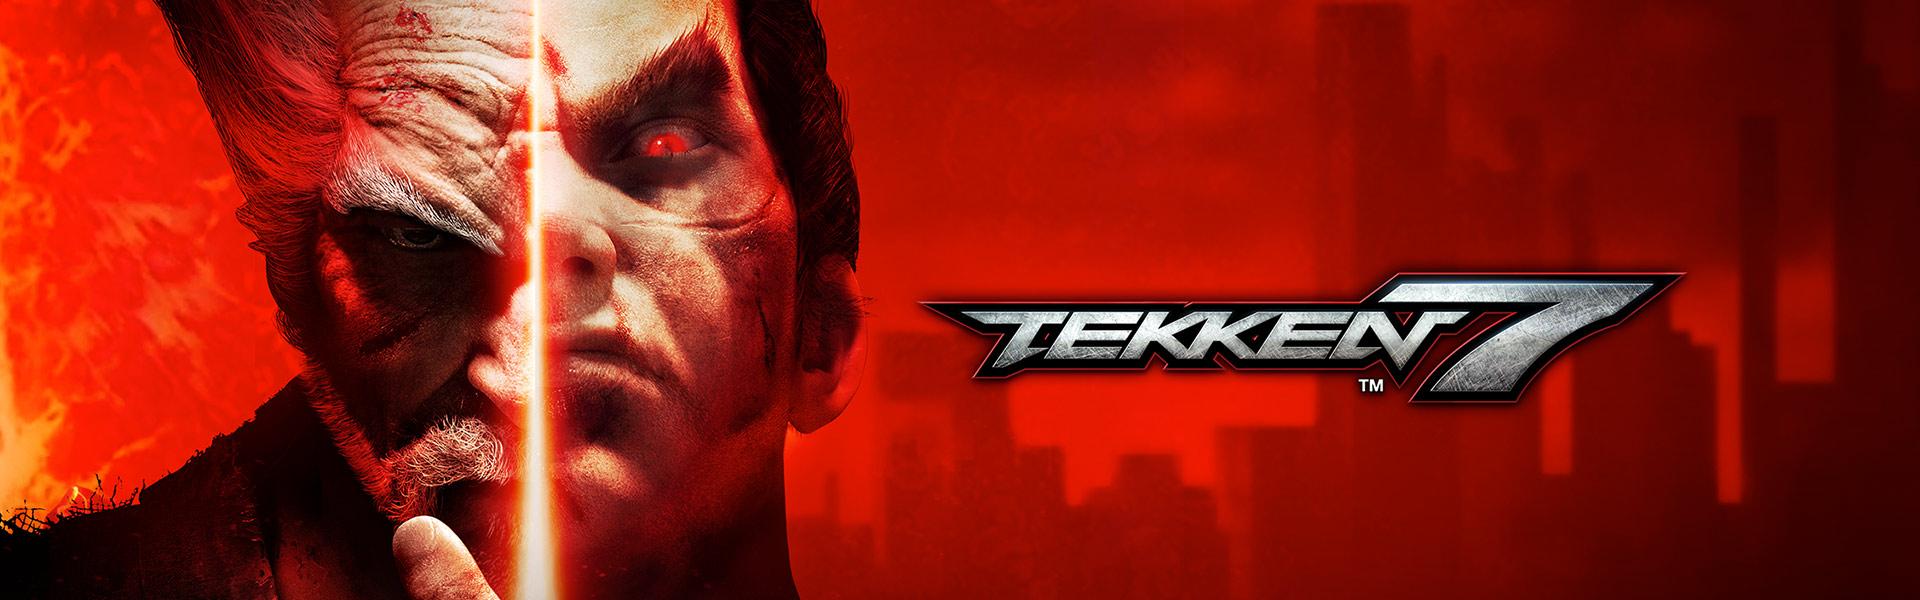 Personajes del juego de Tekken 7